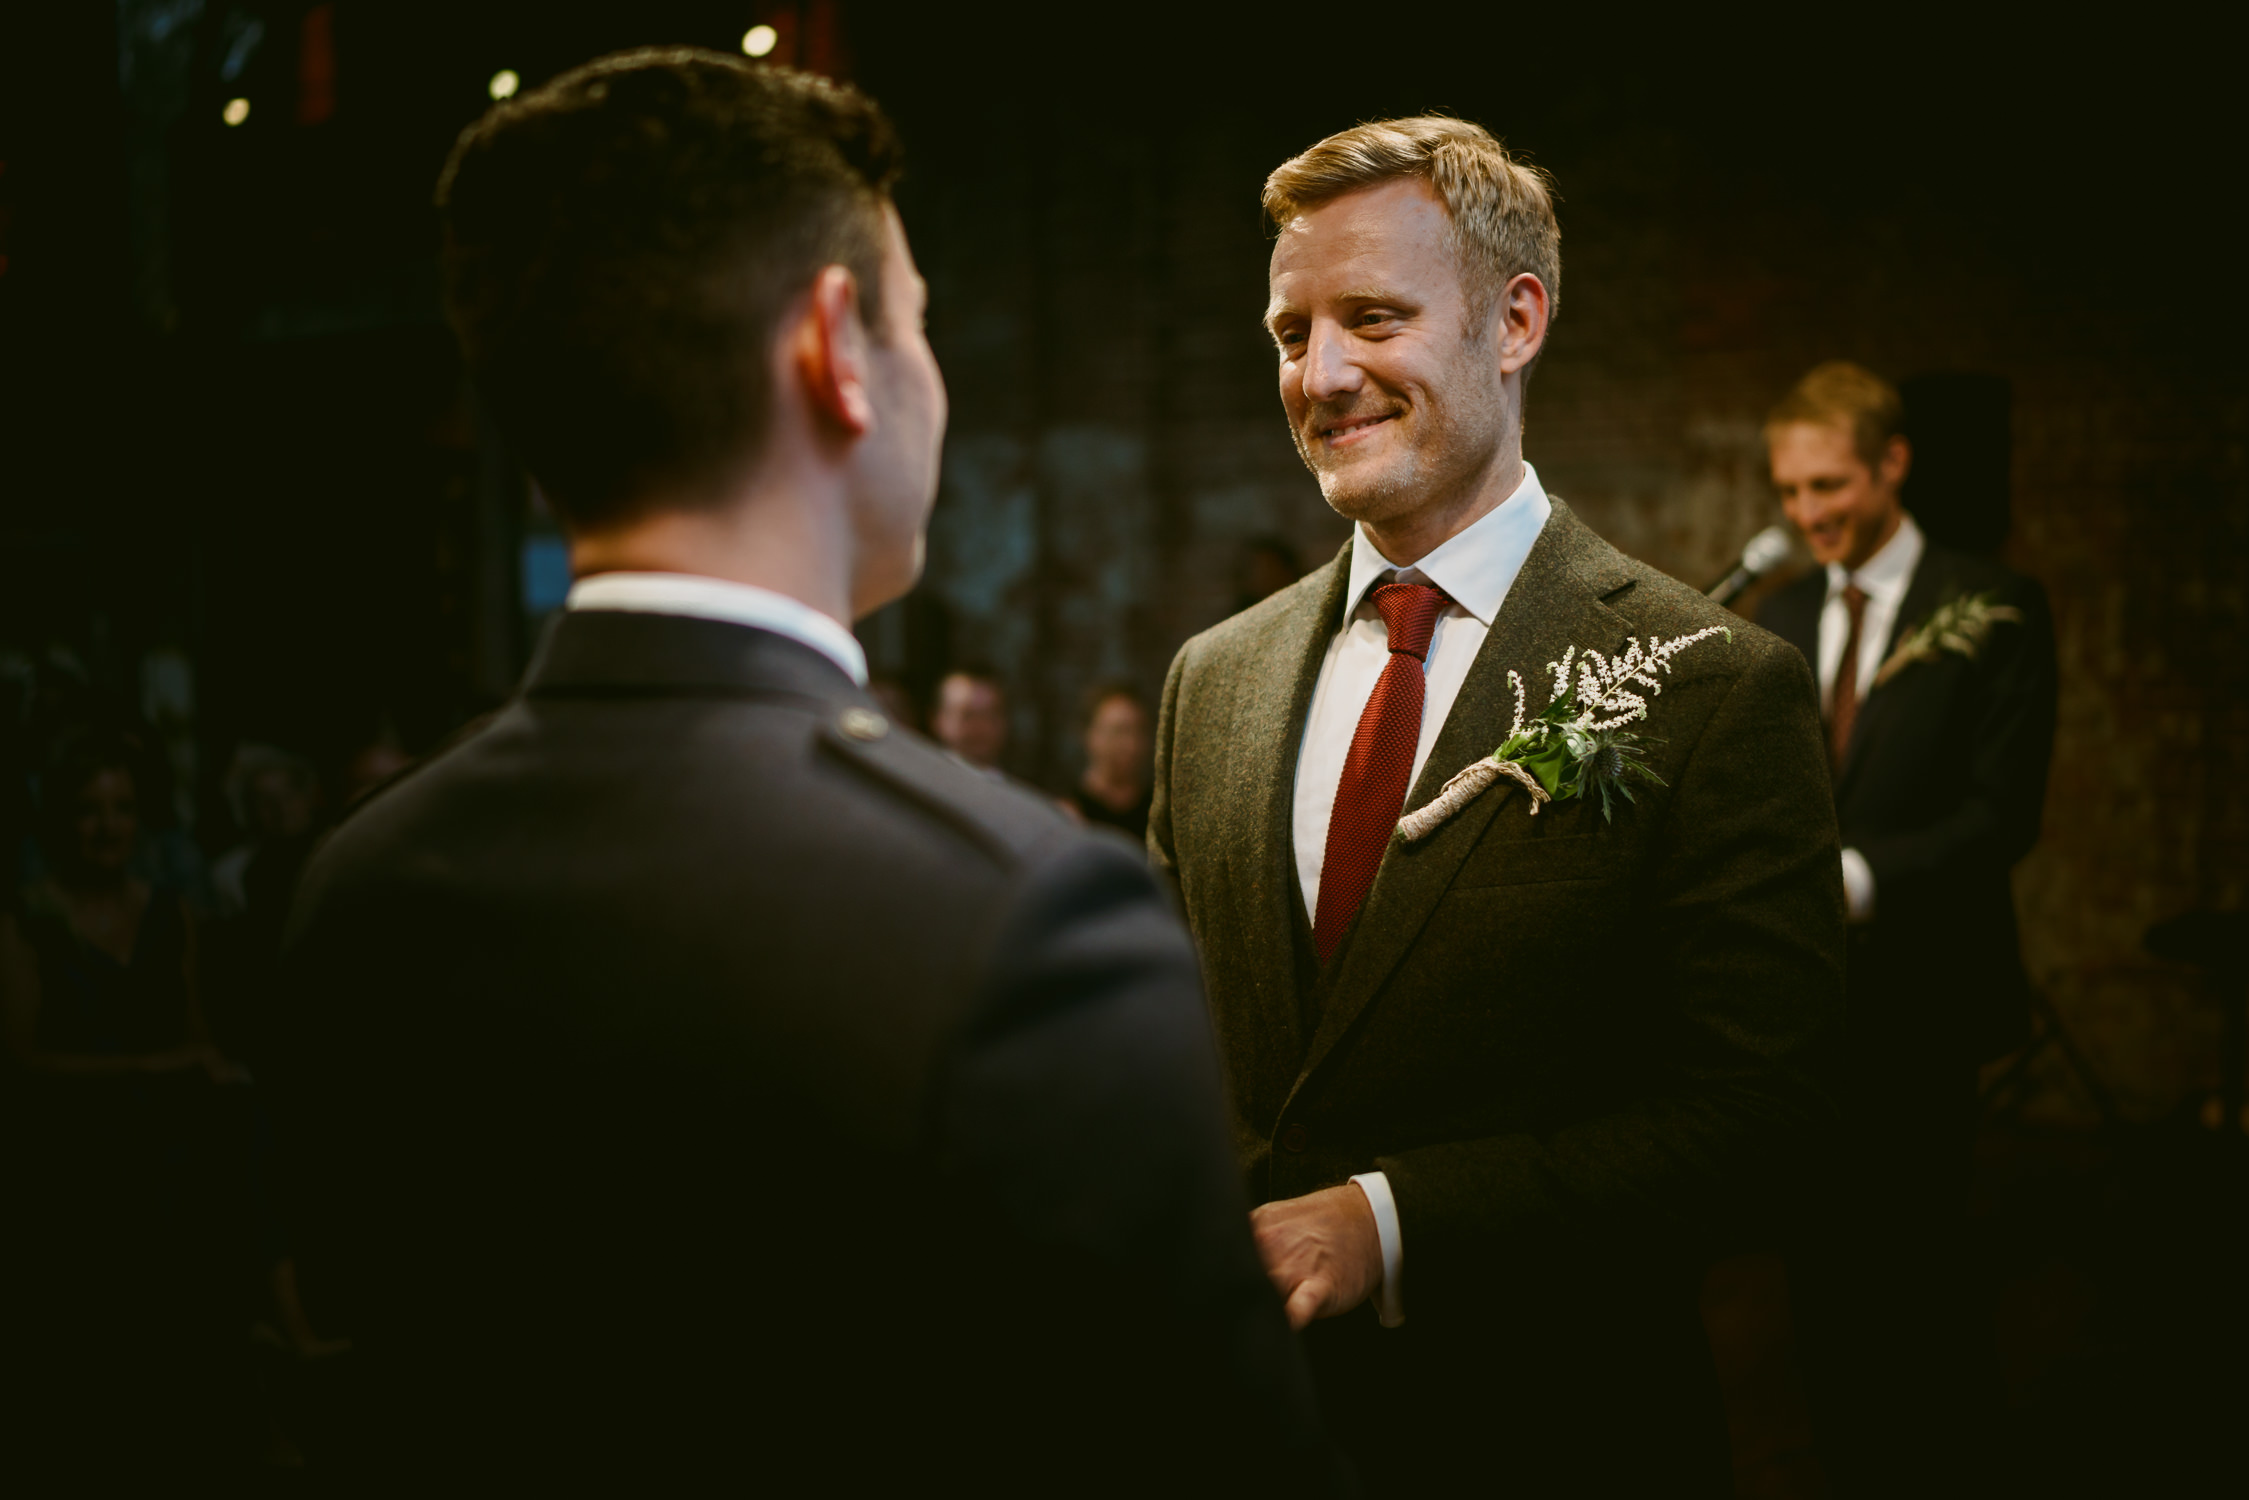 amsterdam-wedding-photographer-trouwfotograaf-bruidsfotograaf-mark-hadden-bruidsfotografie-David & Ronald-194.jpg